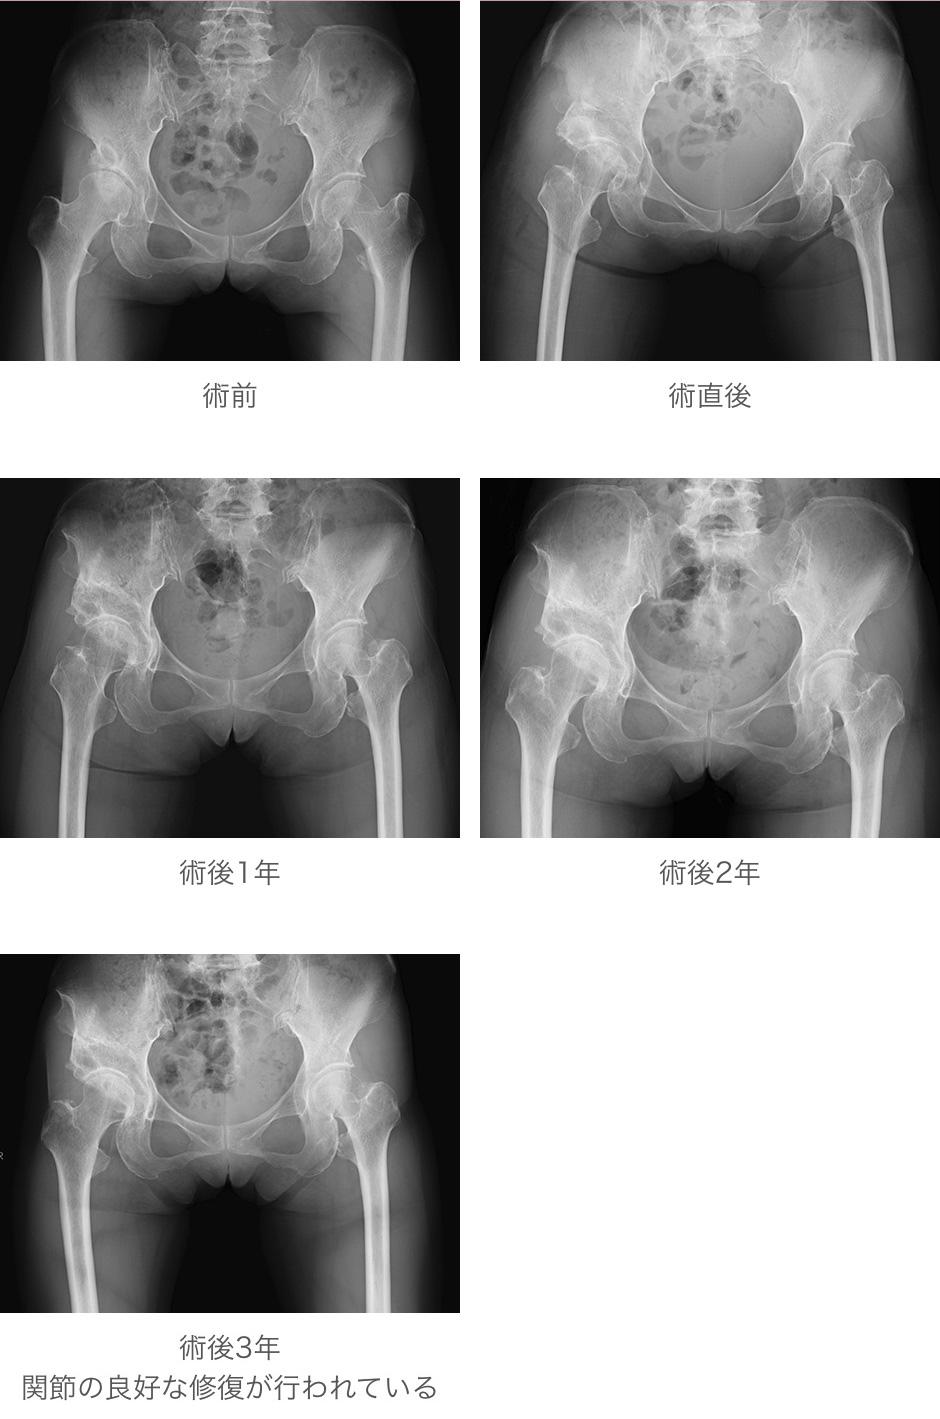 臼蓋回転骨切り術